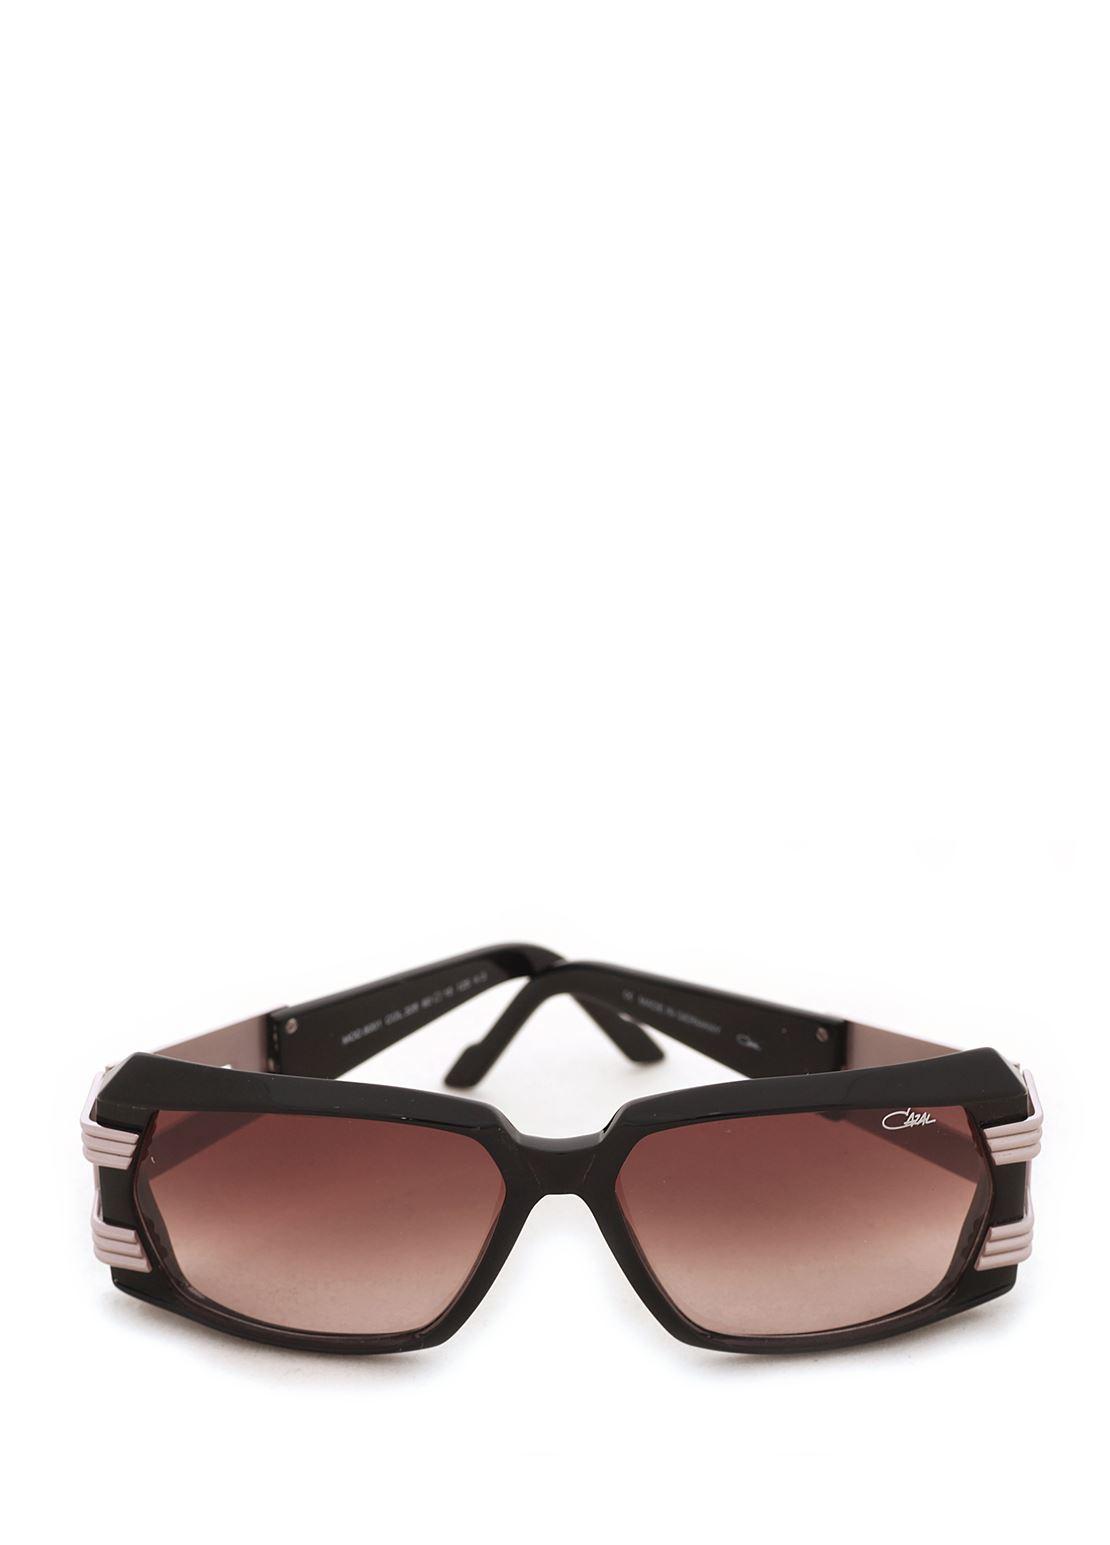 ba76e901d3 Γυναικεία Γυαλιά Ηλίου CAZAL